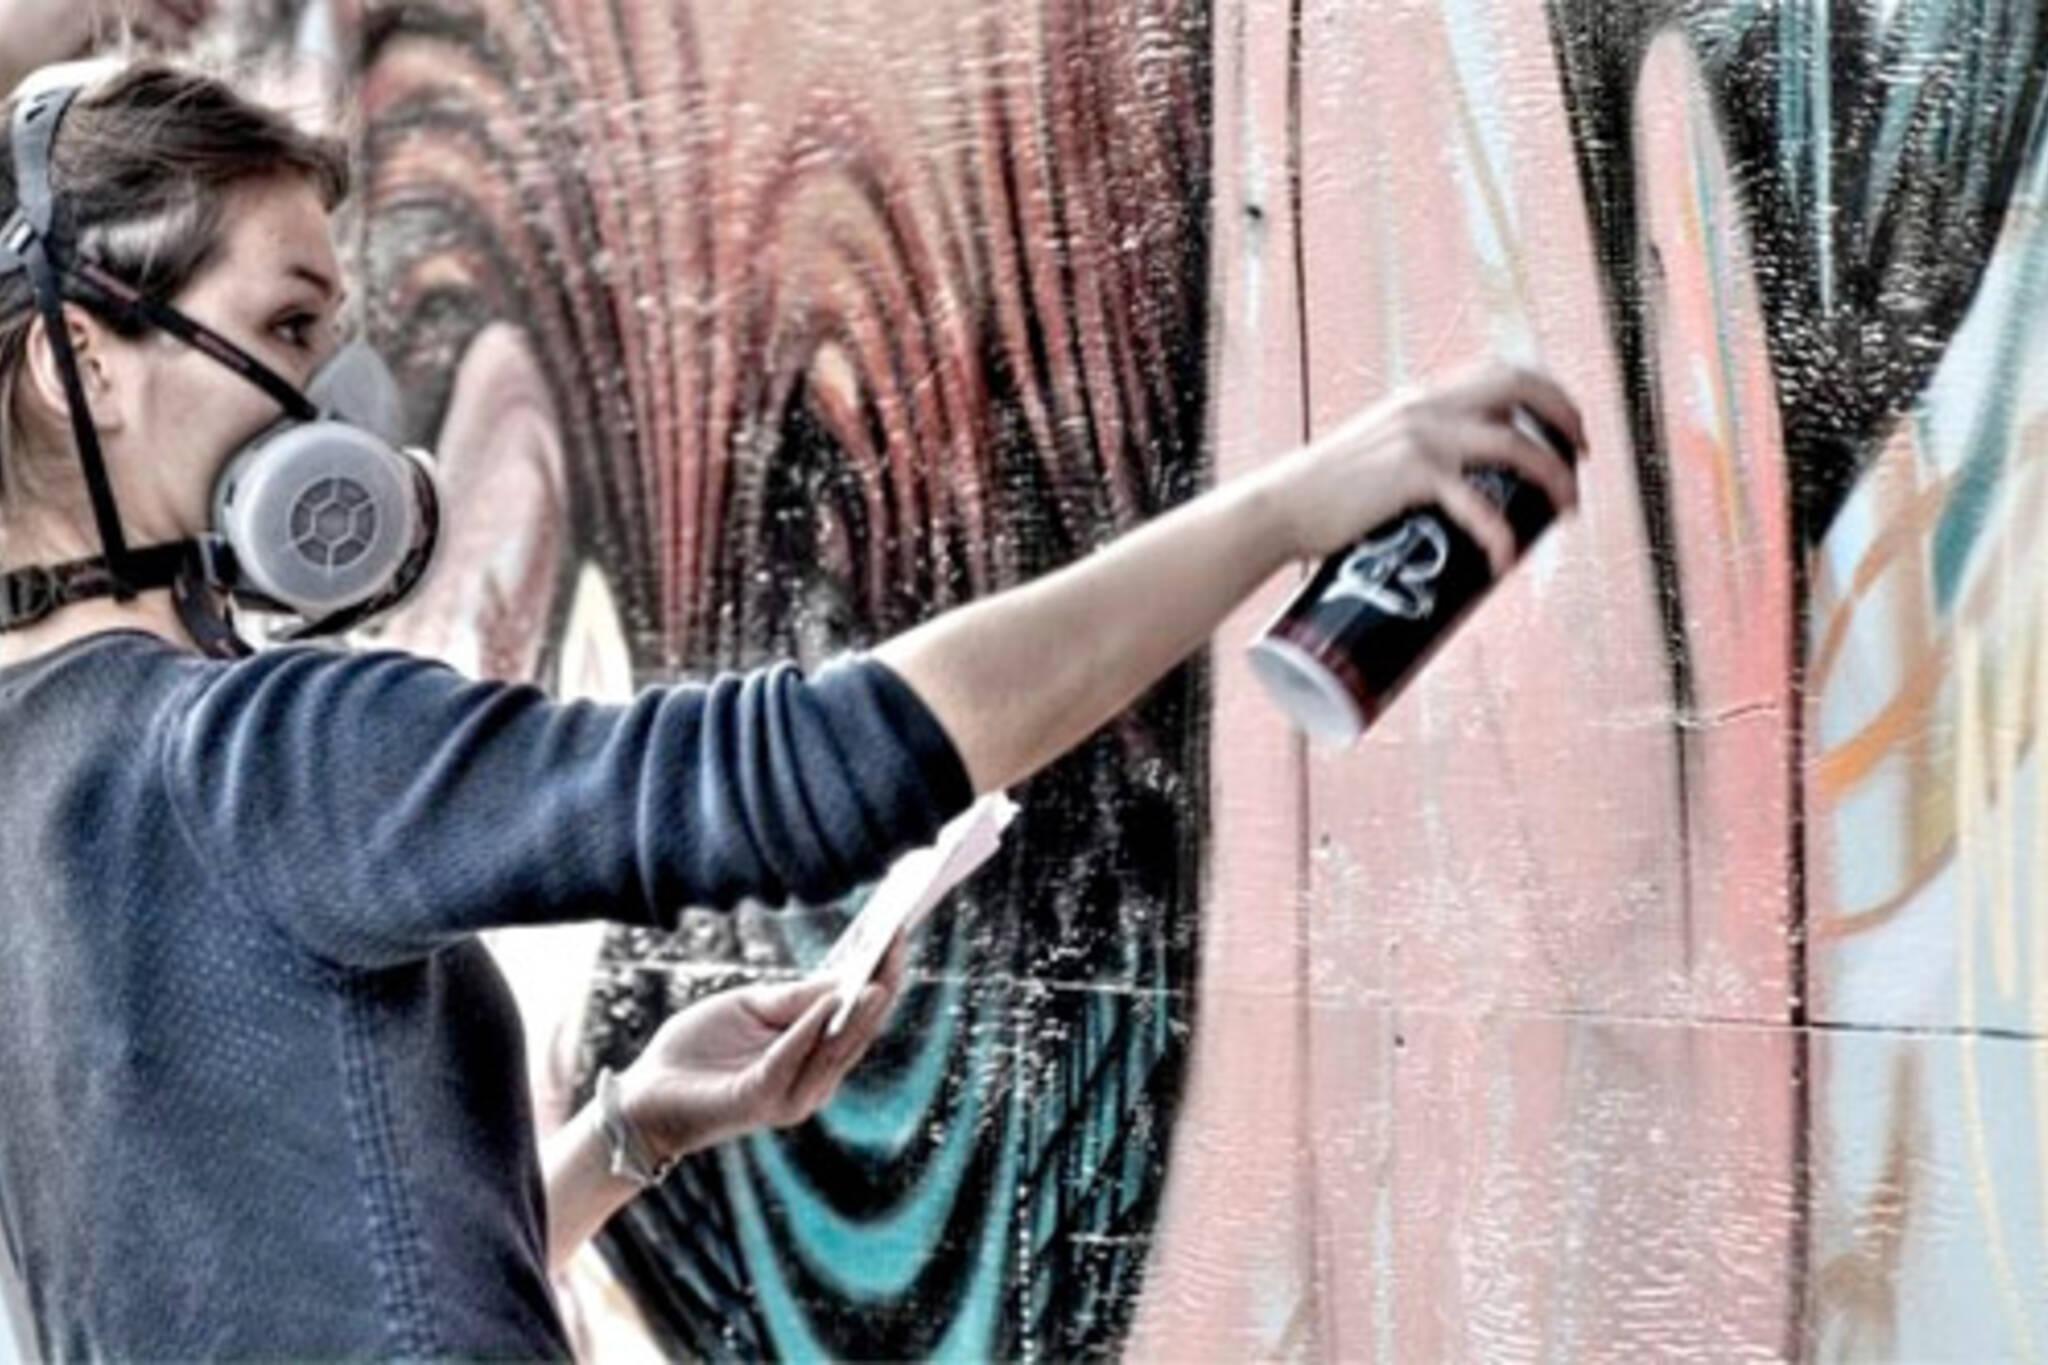 toronto graffiti artist